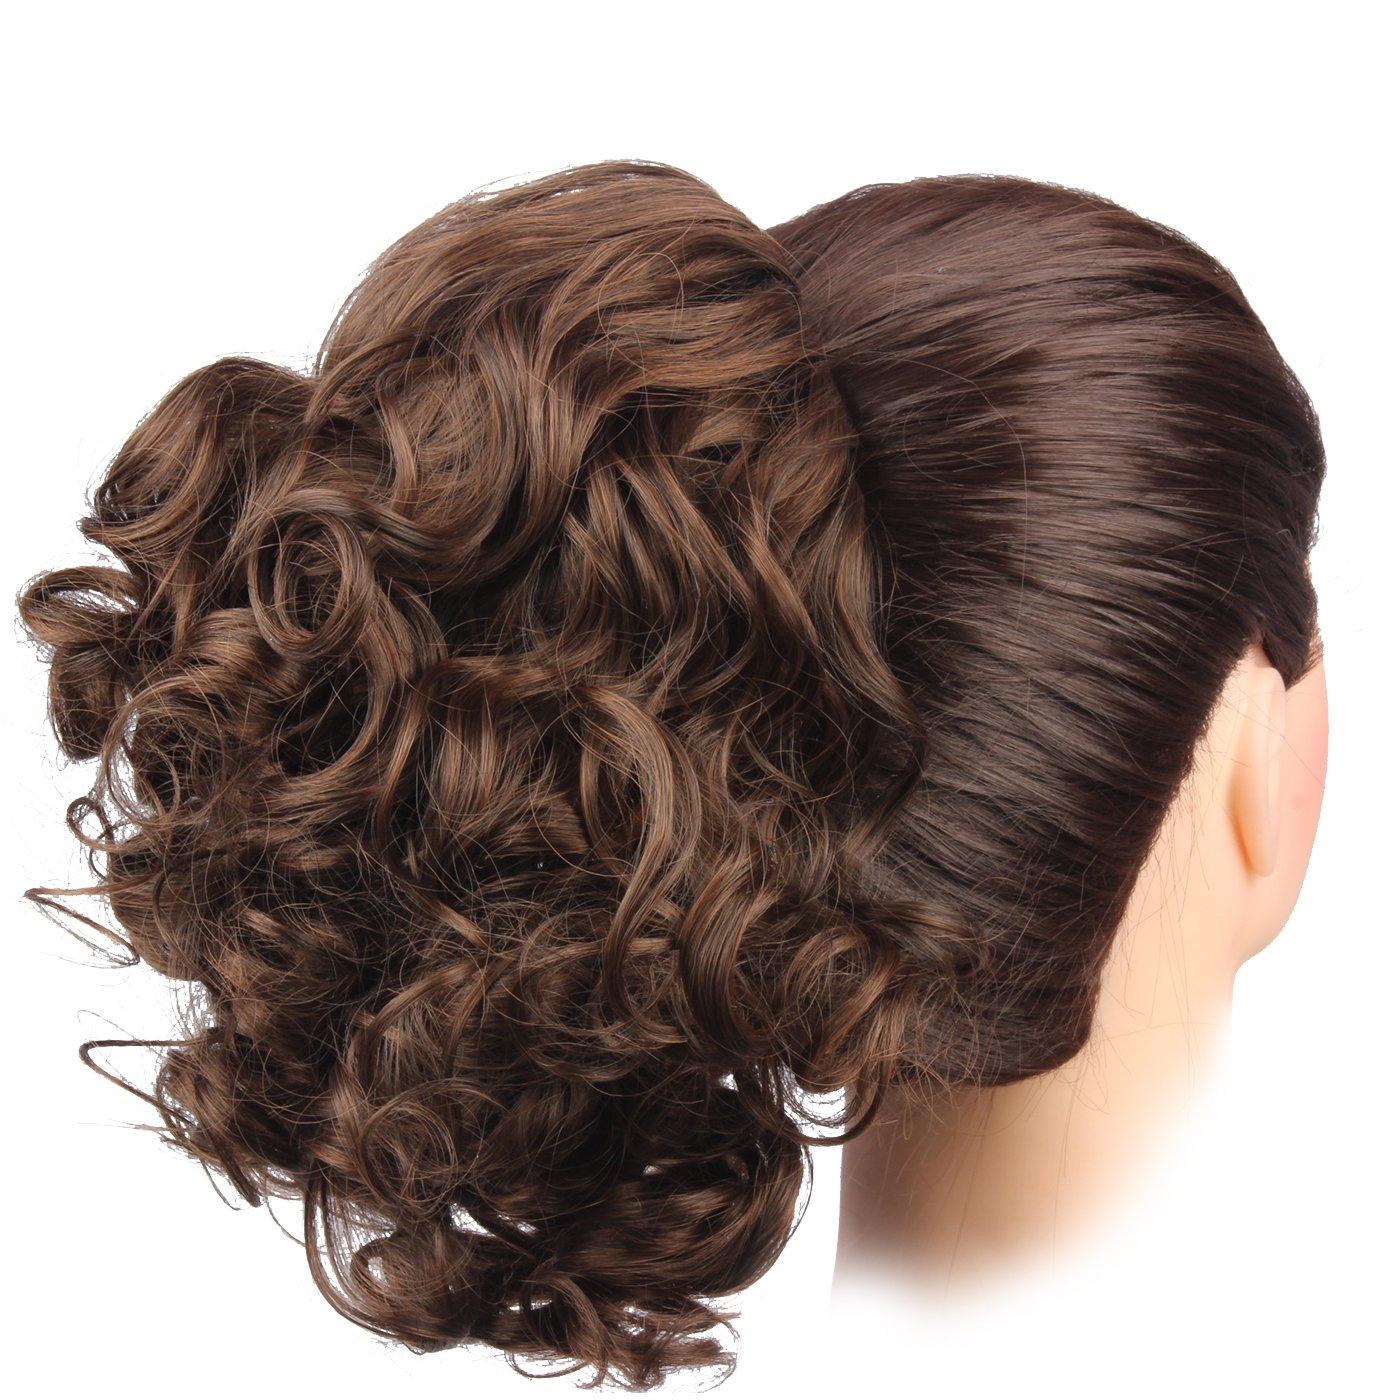 WeKen Women Hair Bun Curly Hair Synthetic Medium Long Hairpiece Dark Brown Yiwu Zhongken Trading Co. Ltd.